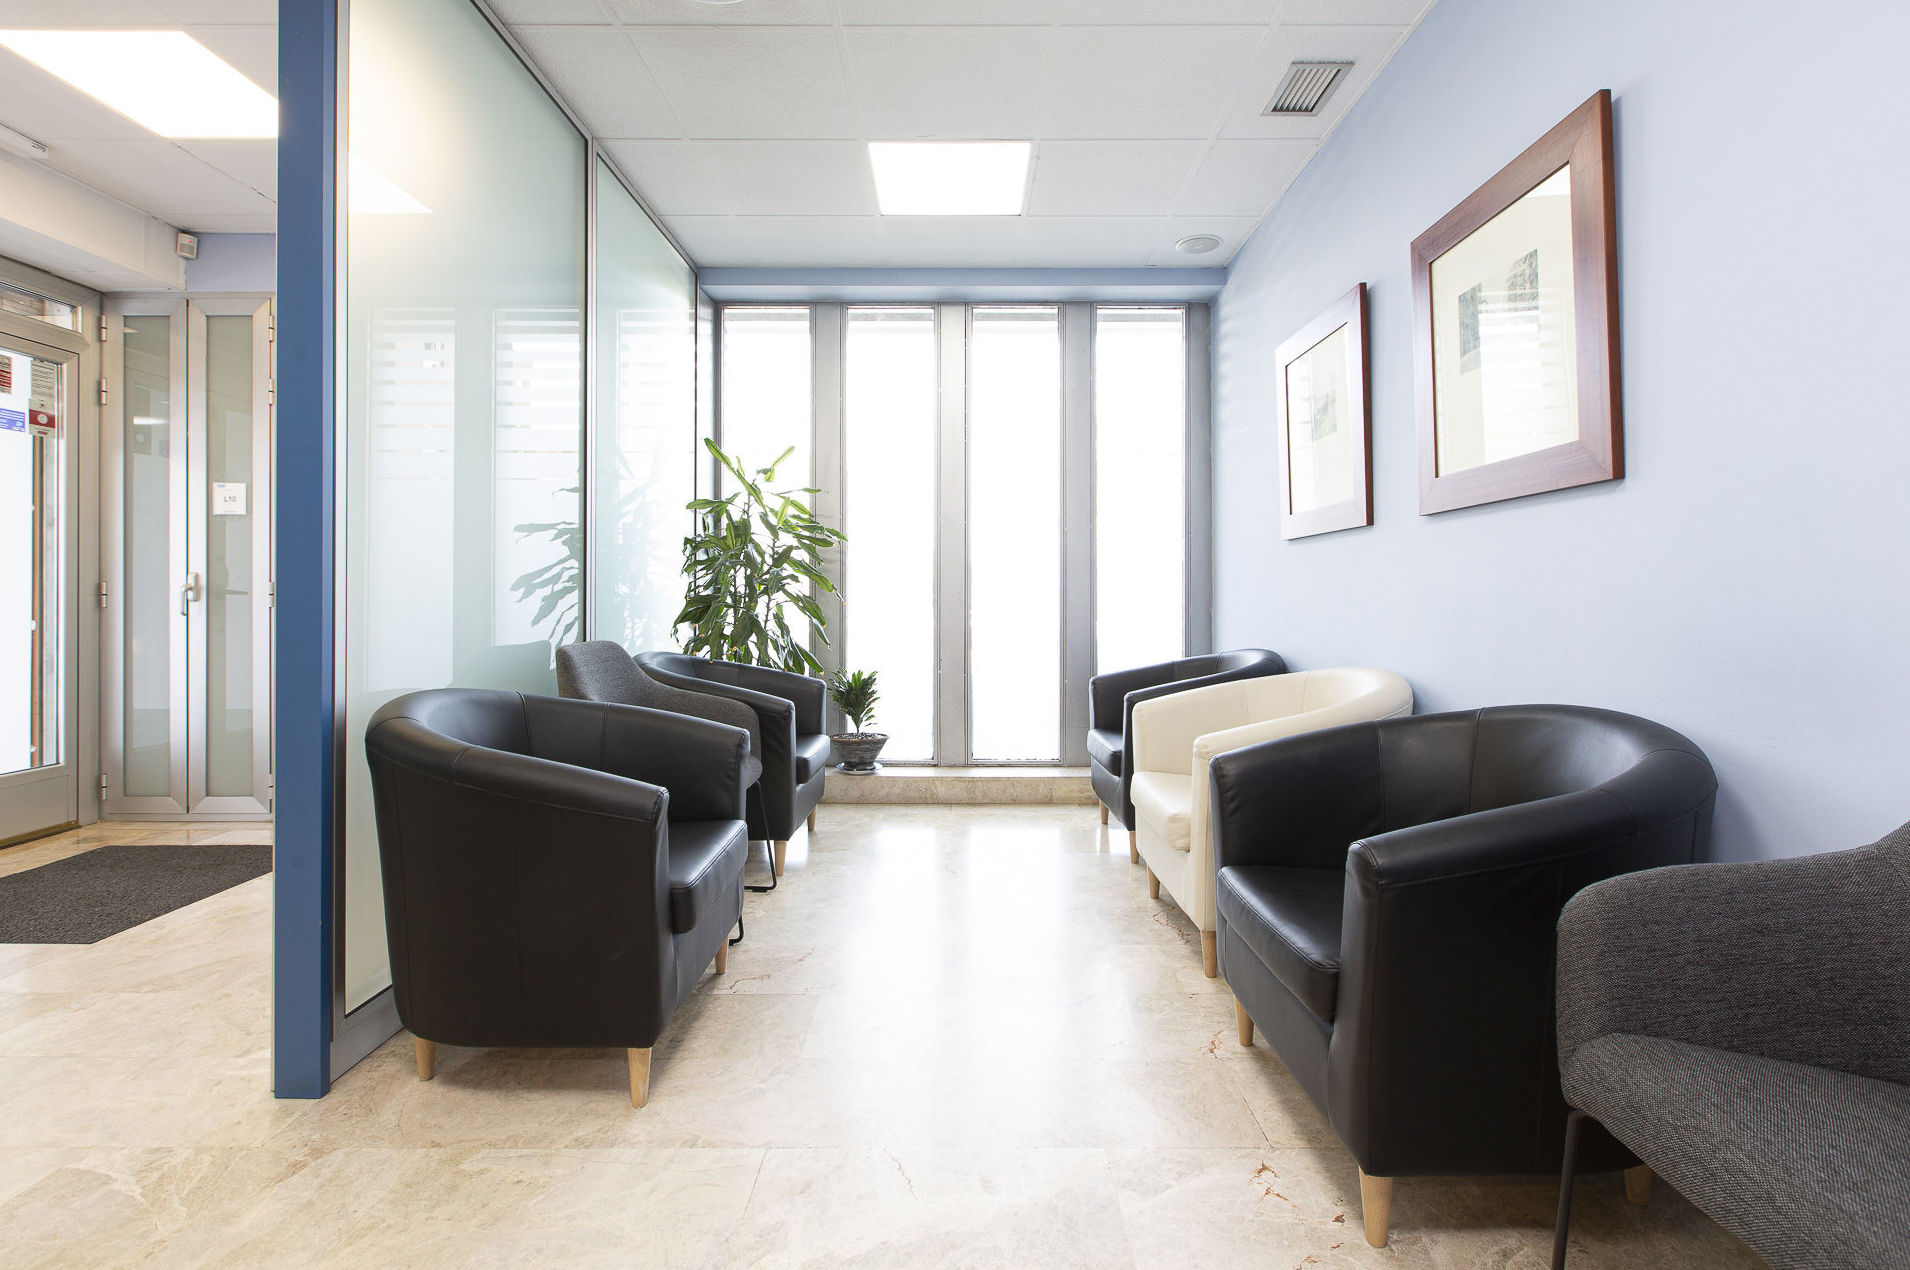 Foto 6 de Dentistas en  | Clínica Dental Dr. Yagüe